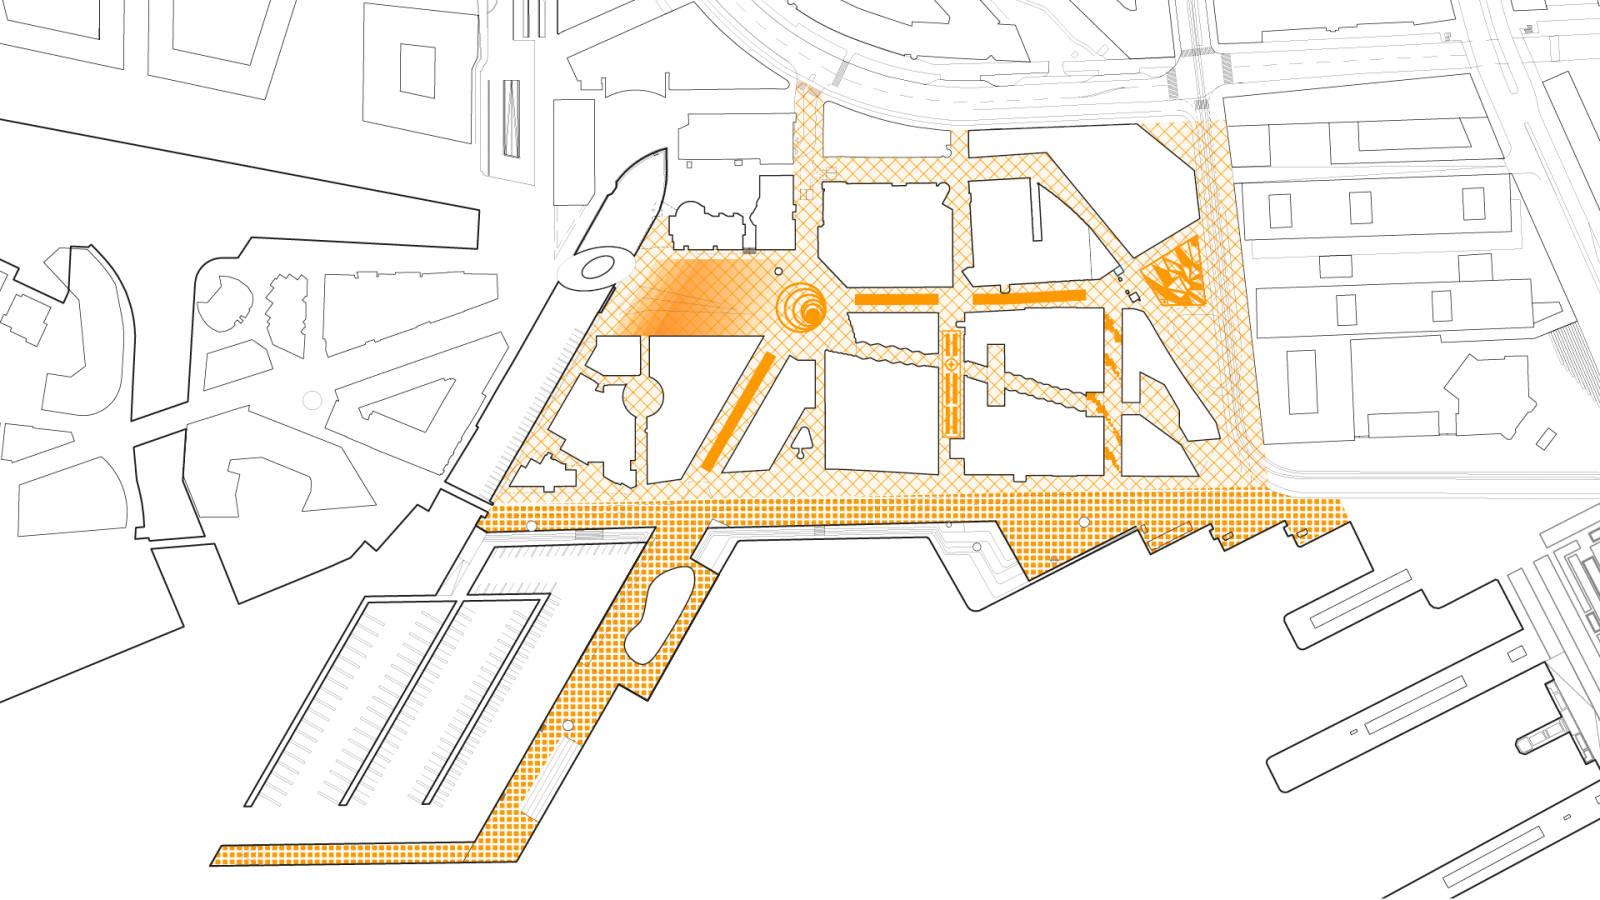 PAVING - Aker Brygge Masterplan - SPOL Architects